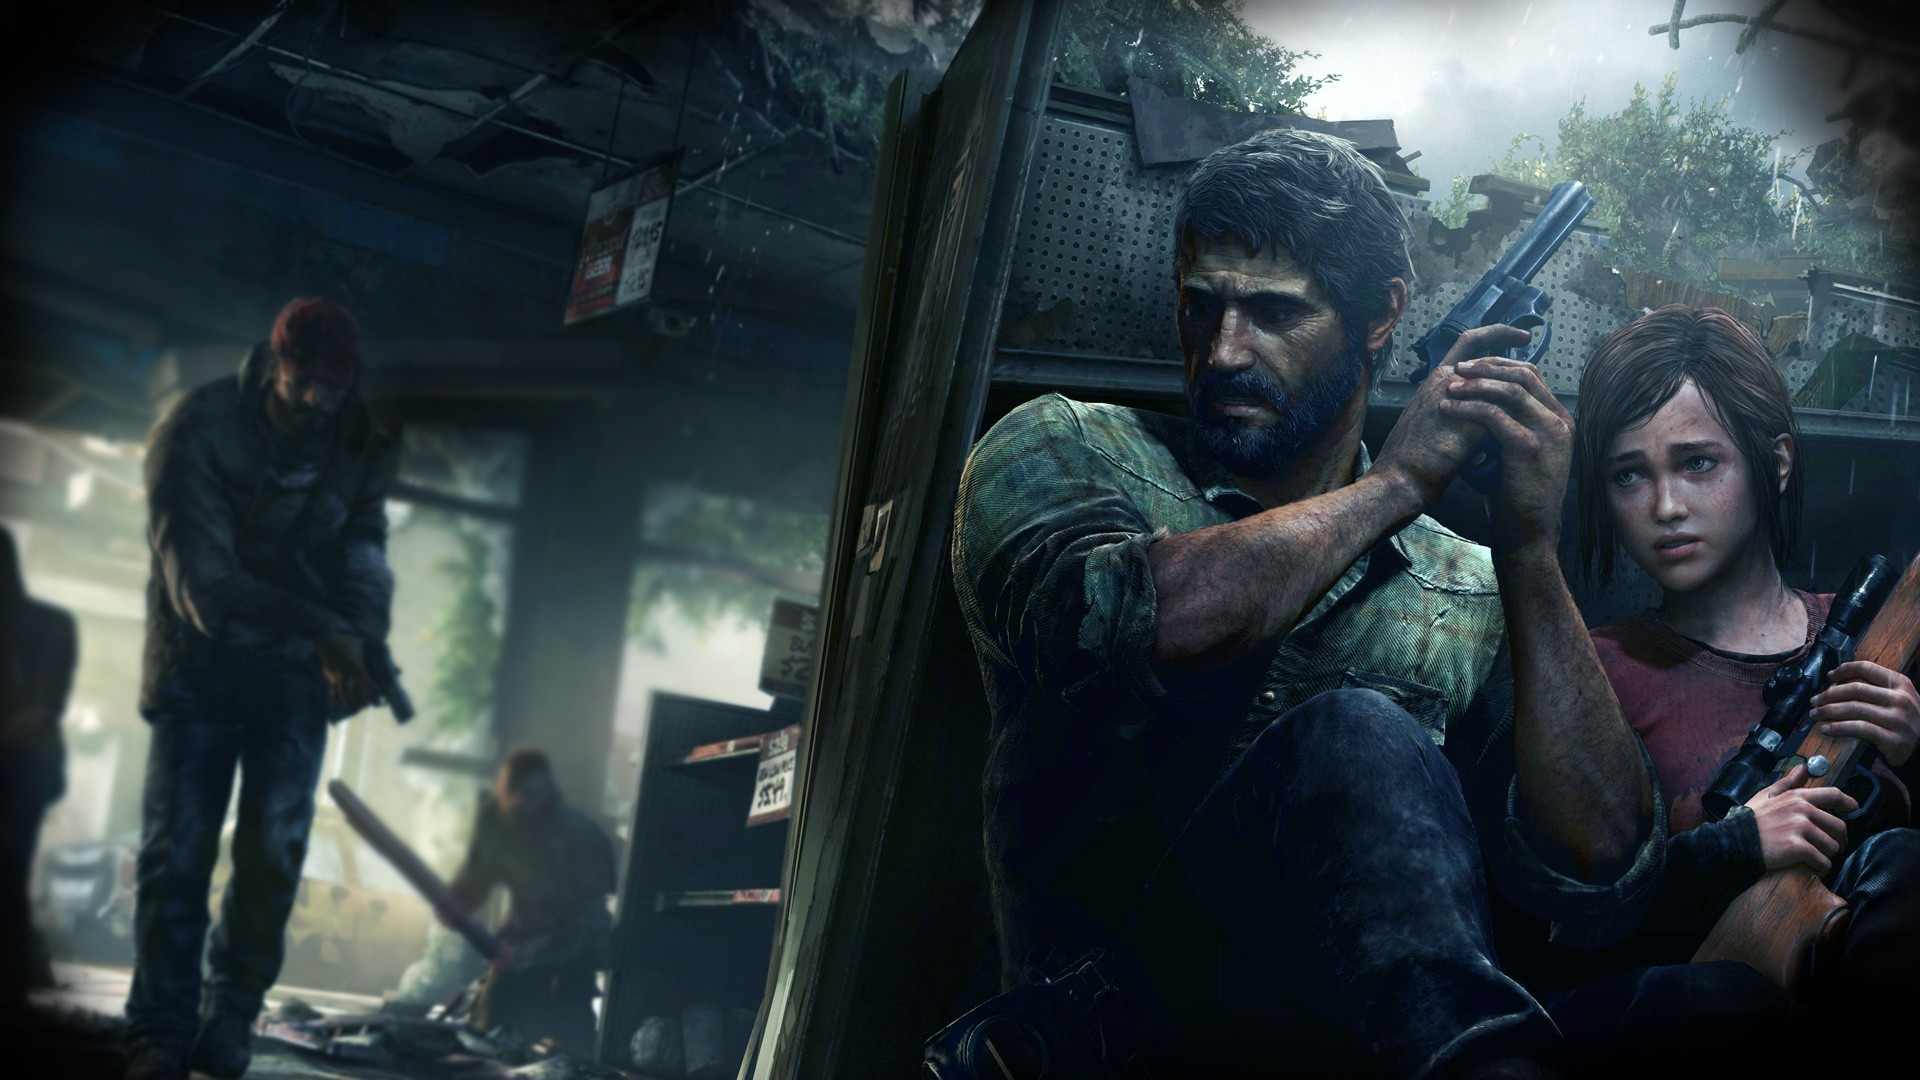 Games like Resident Evil - The Last of Us